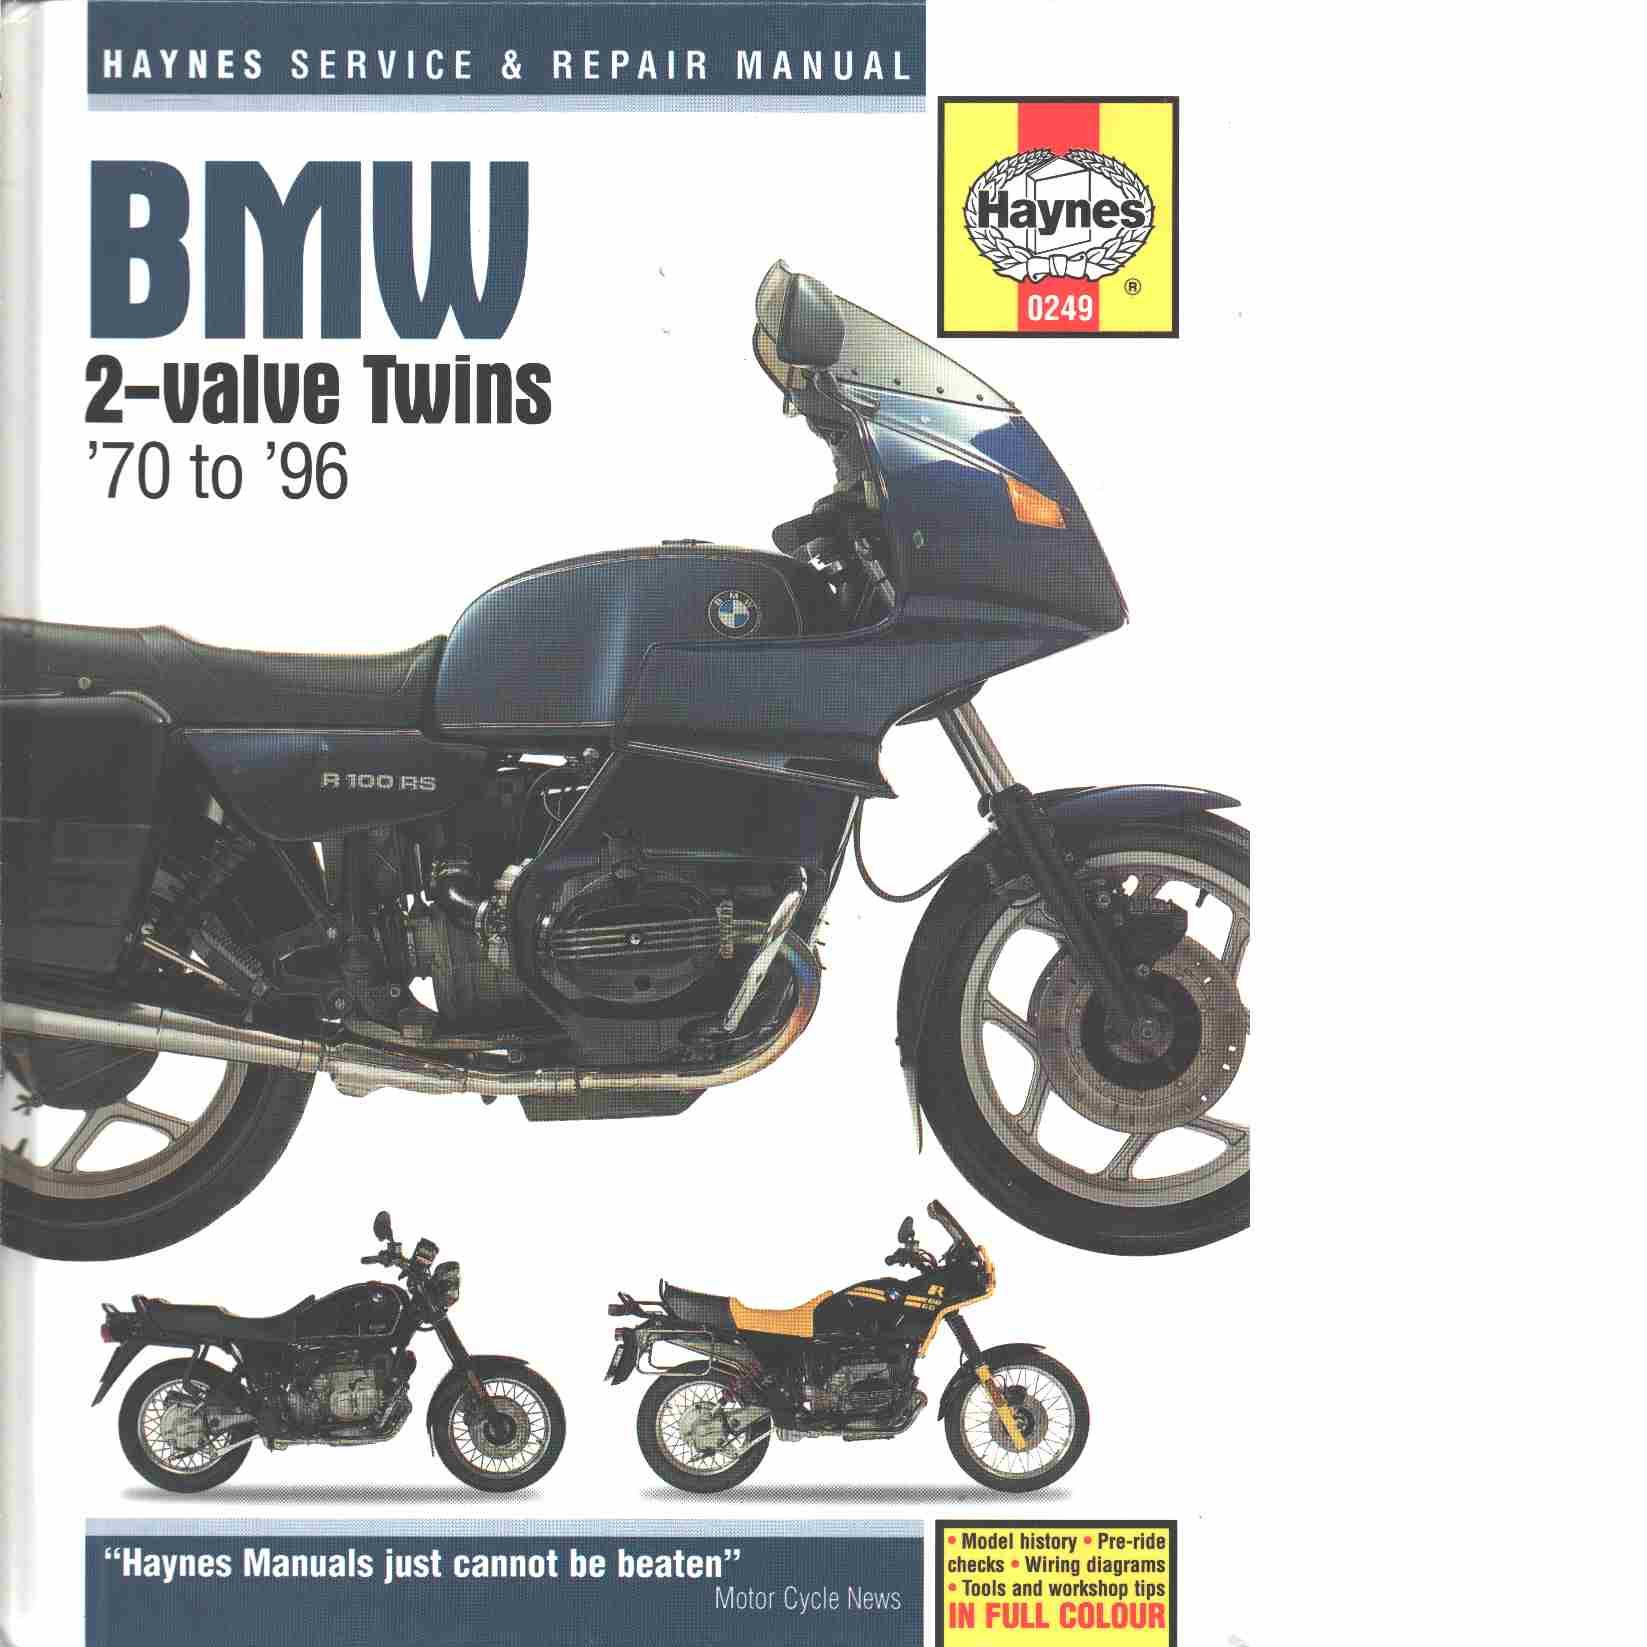 Bmw 2-valve Twins 1970-1996 - Churchill, Jerry